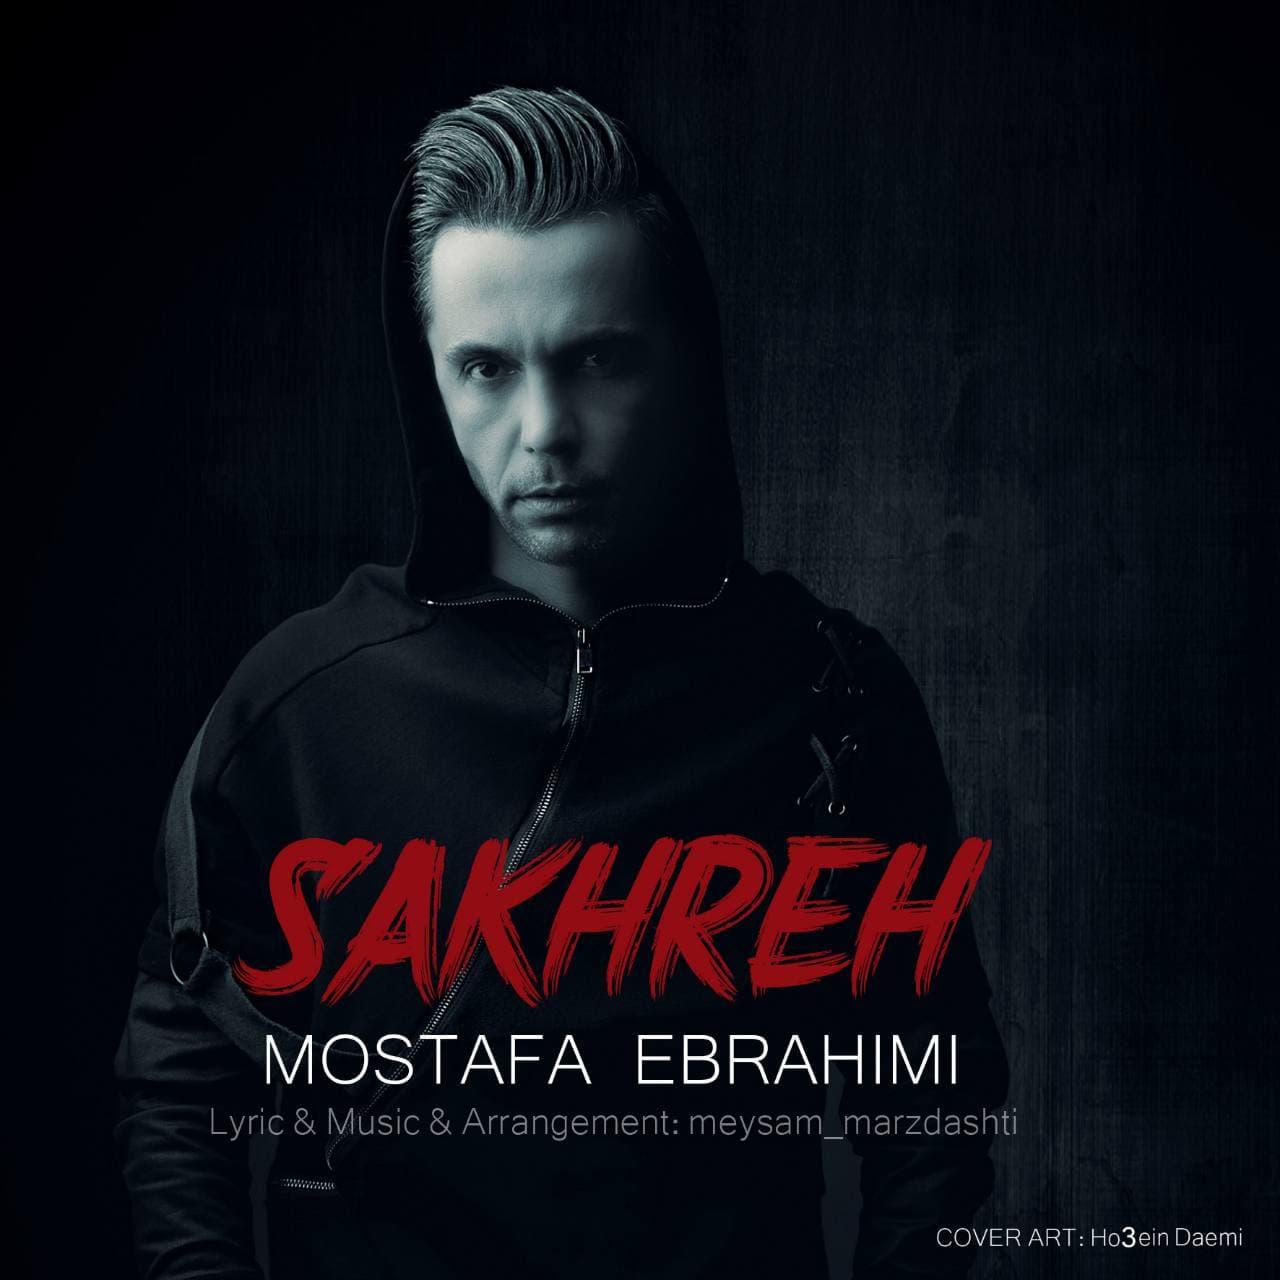 Mostafa Ebrahimi – Sakhreh